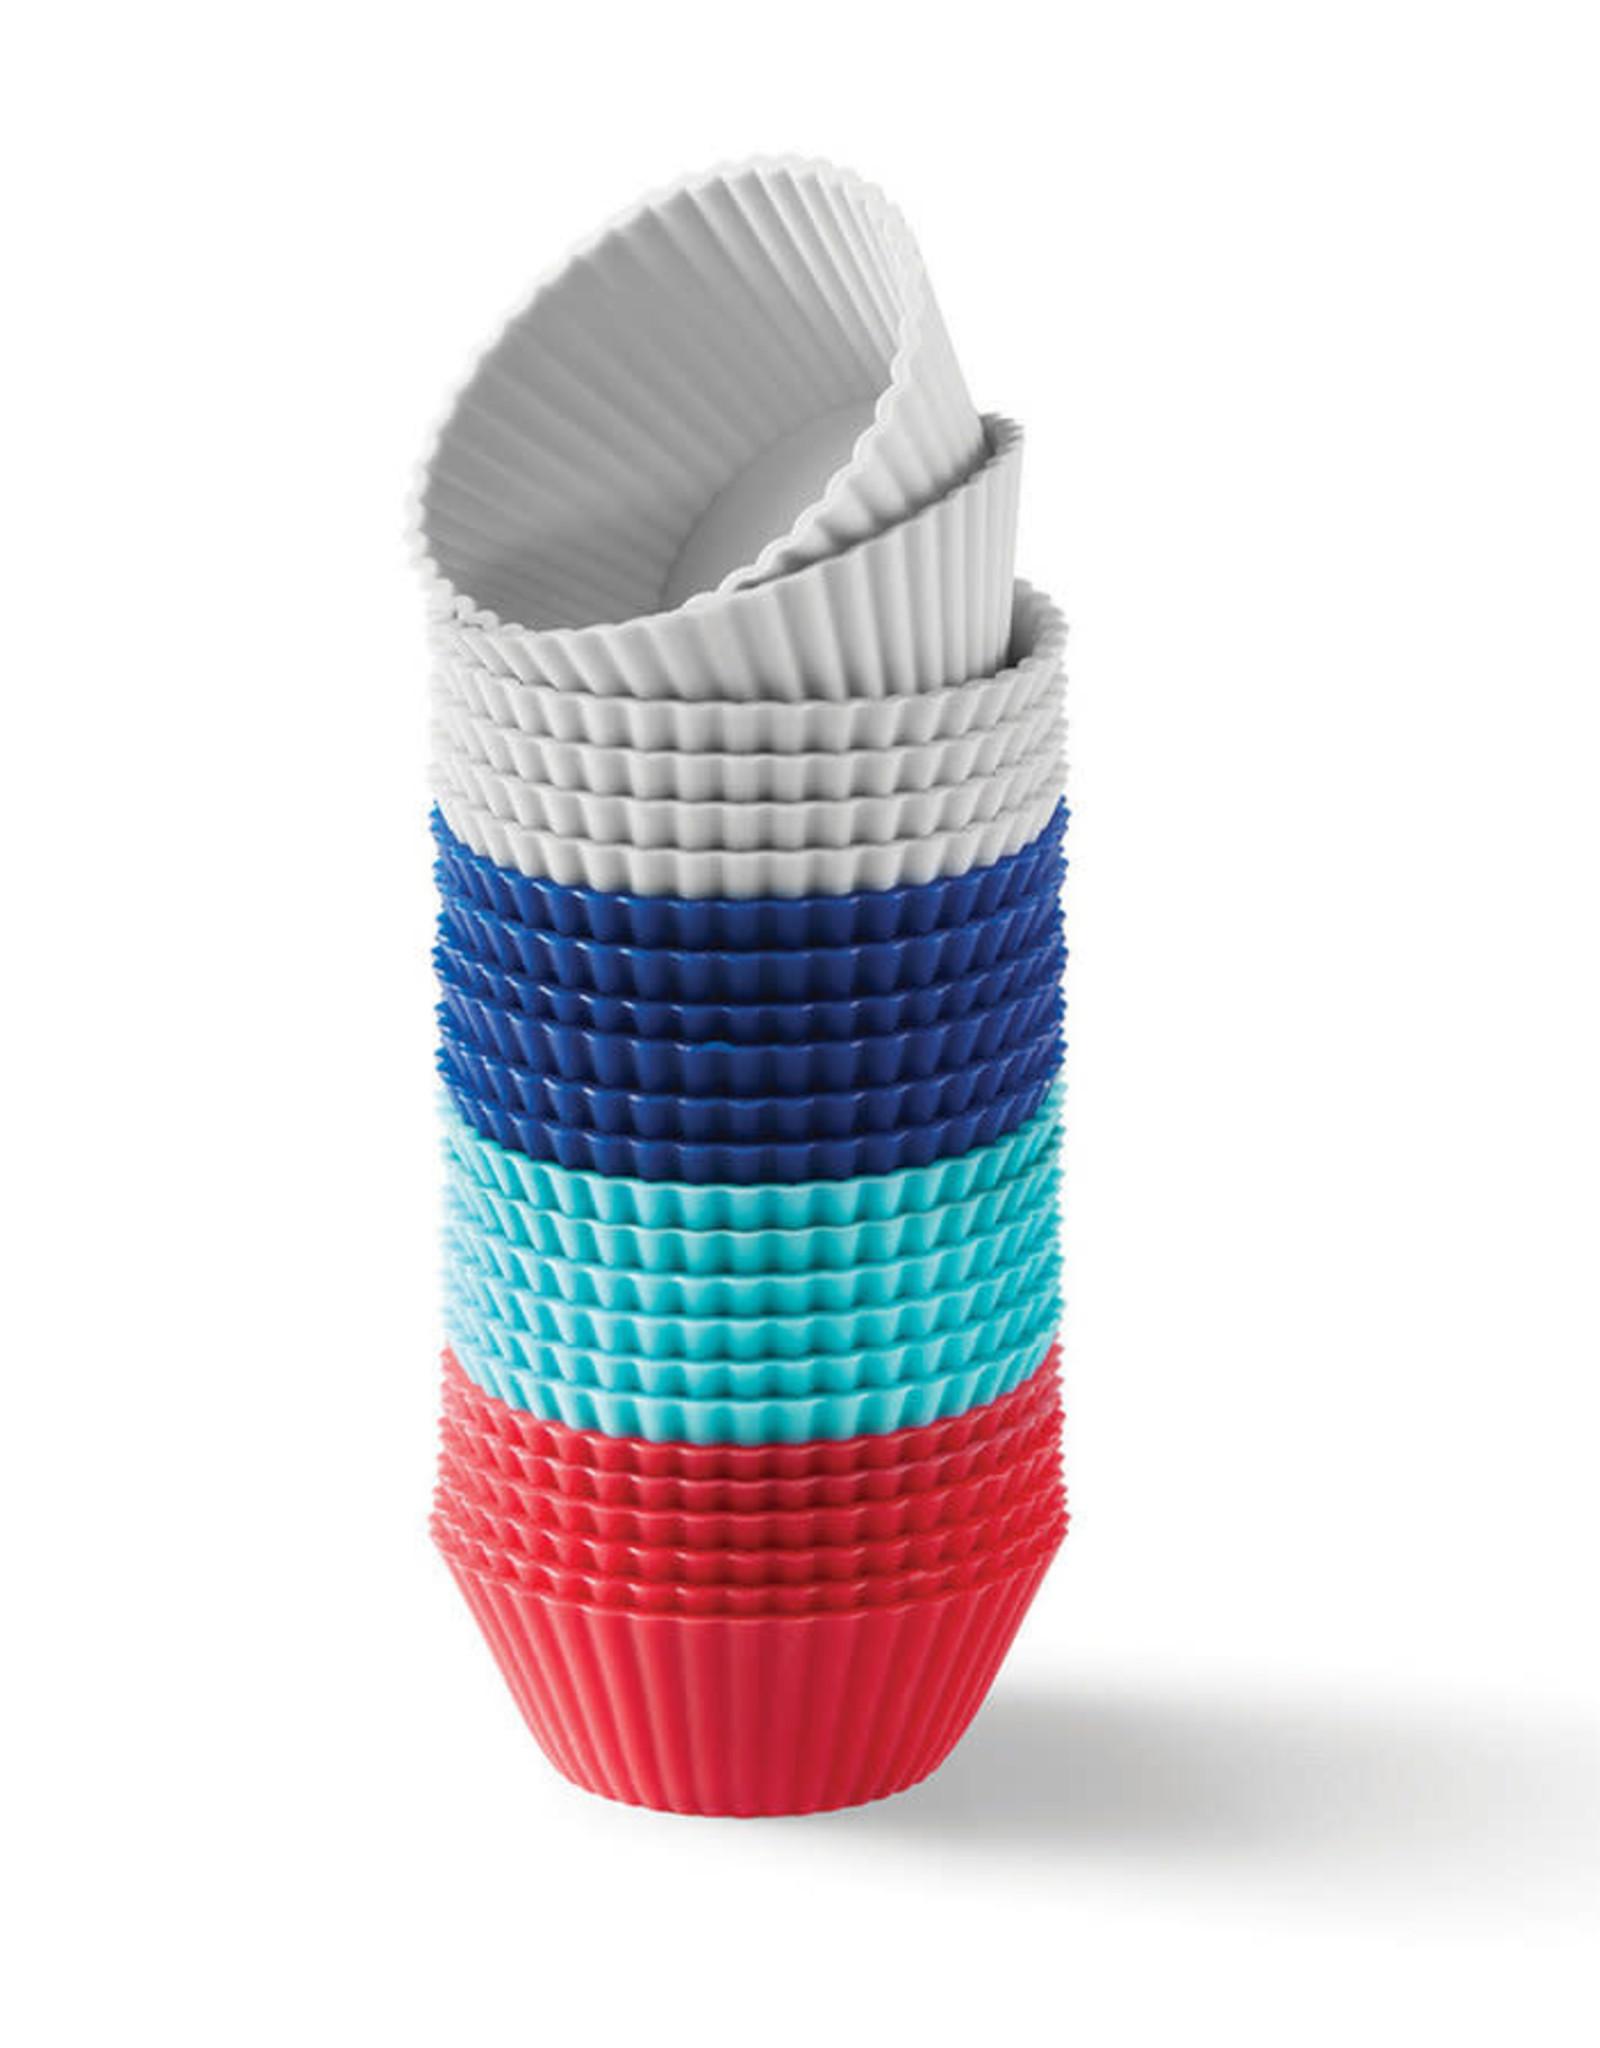 Ricardo Mini moules a muffin en silicone - 24 Pces